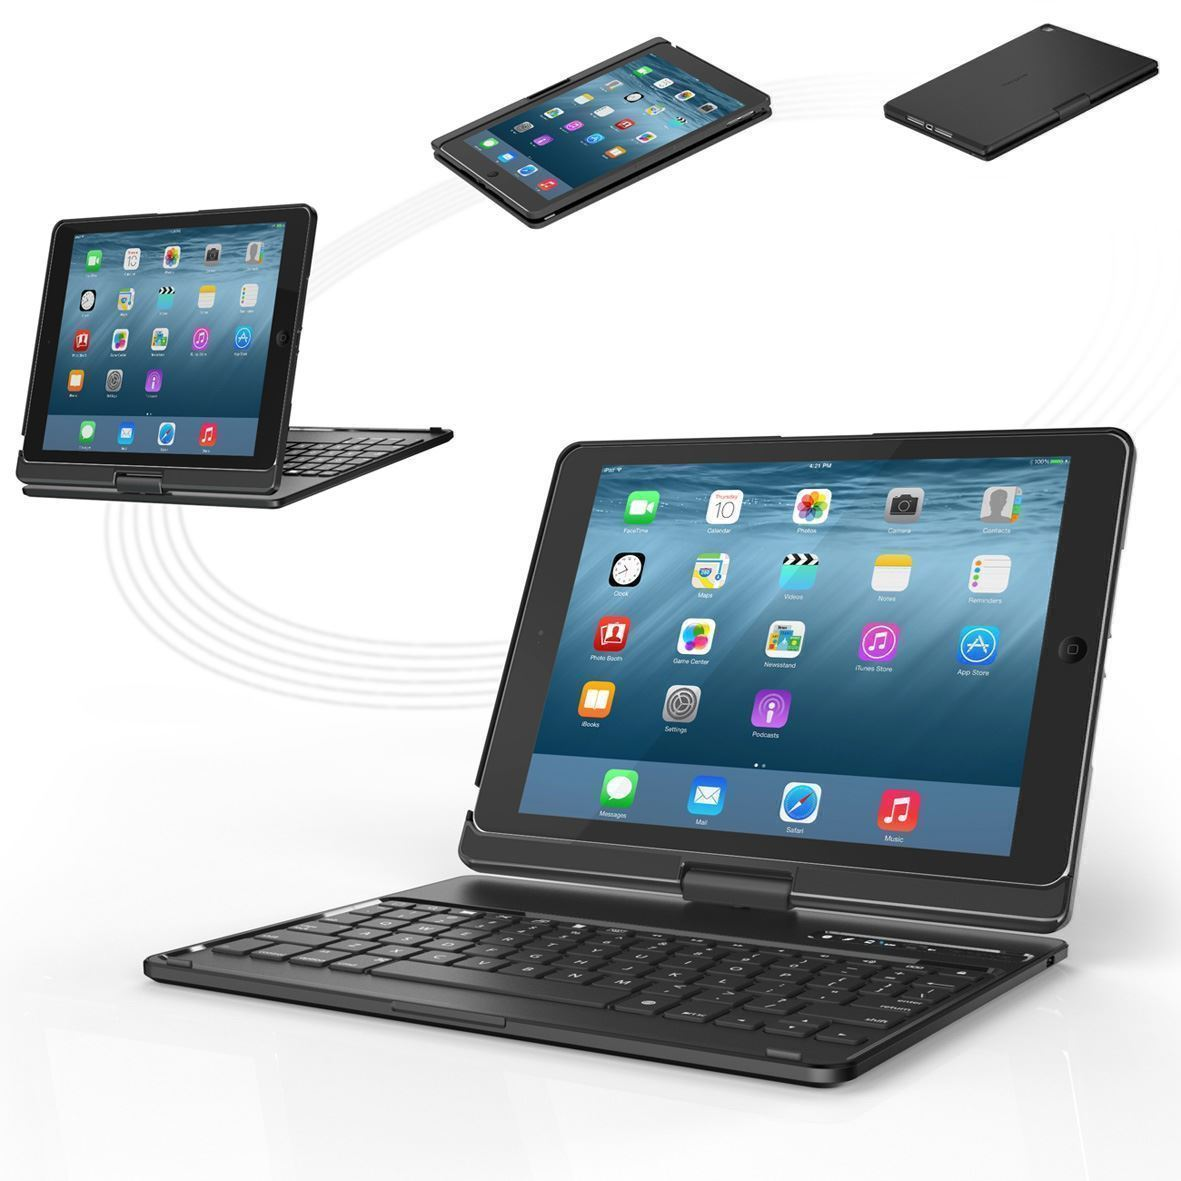 VersaType™ Hard Shell Keyboard Case (Arabic Layout) for iPad